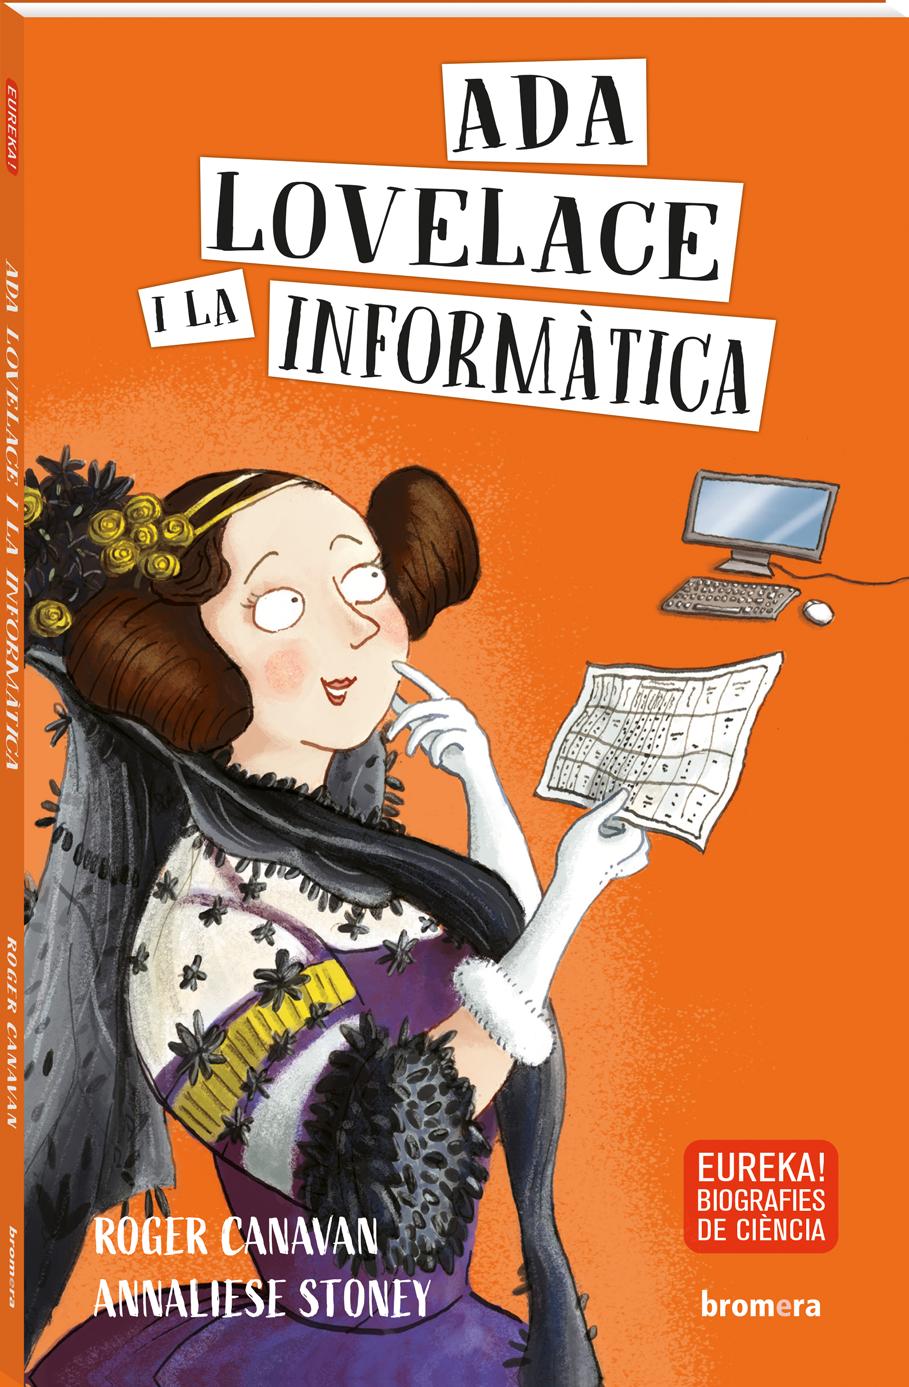 Ada-Lovelace-i-la-informatica_1.png